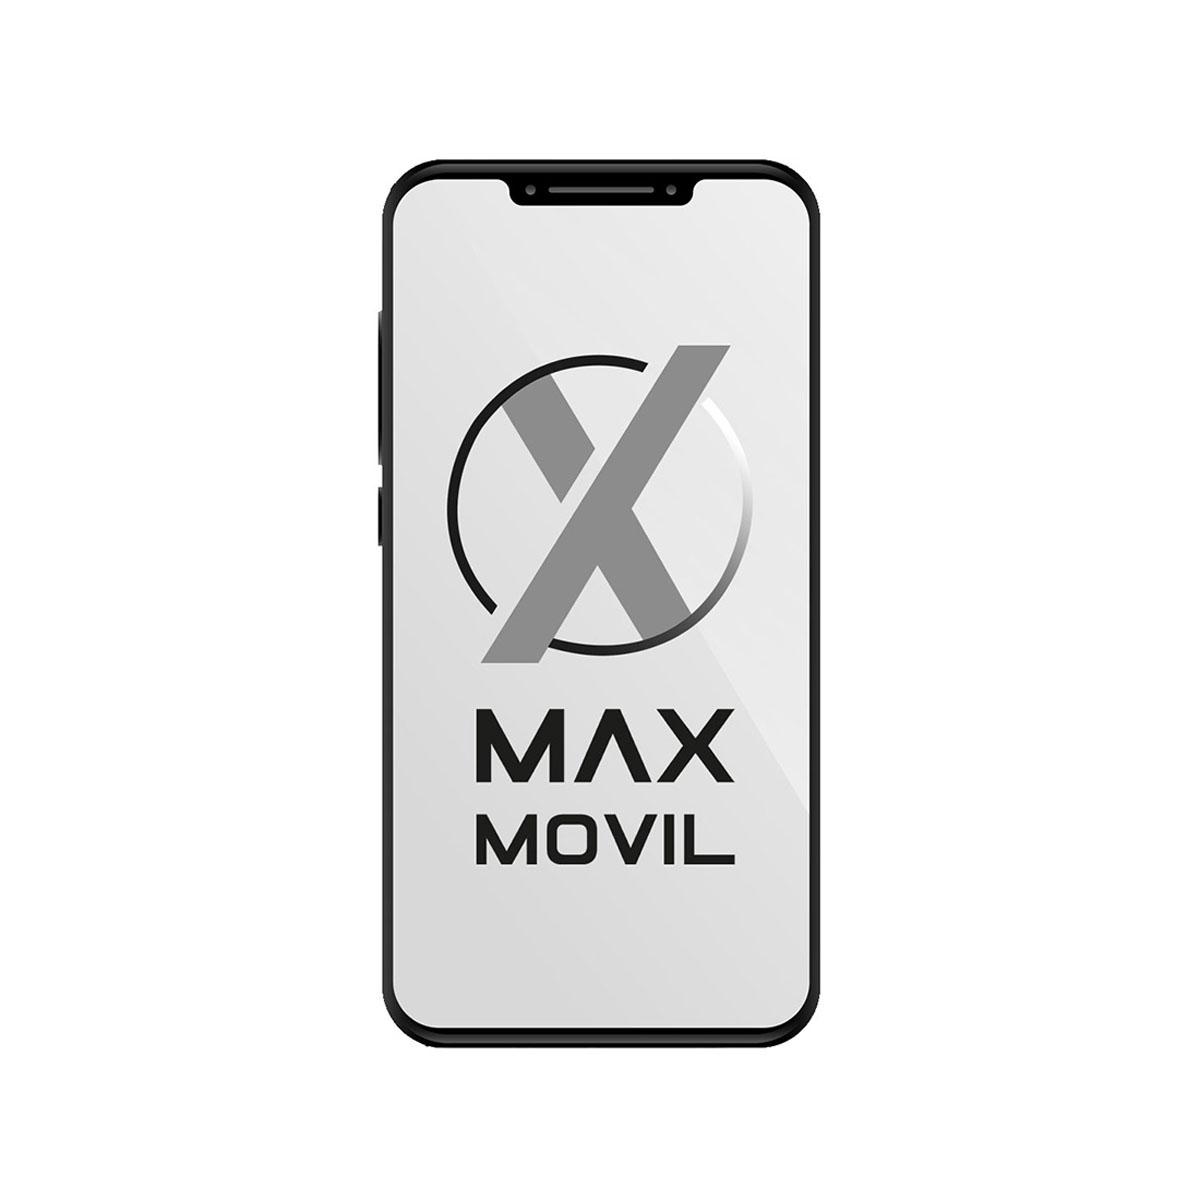 Funda iPhone 12 Pro Max Transparente de Silicona Gel